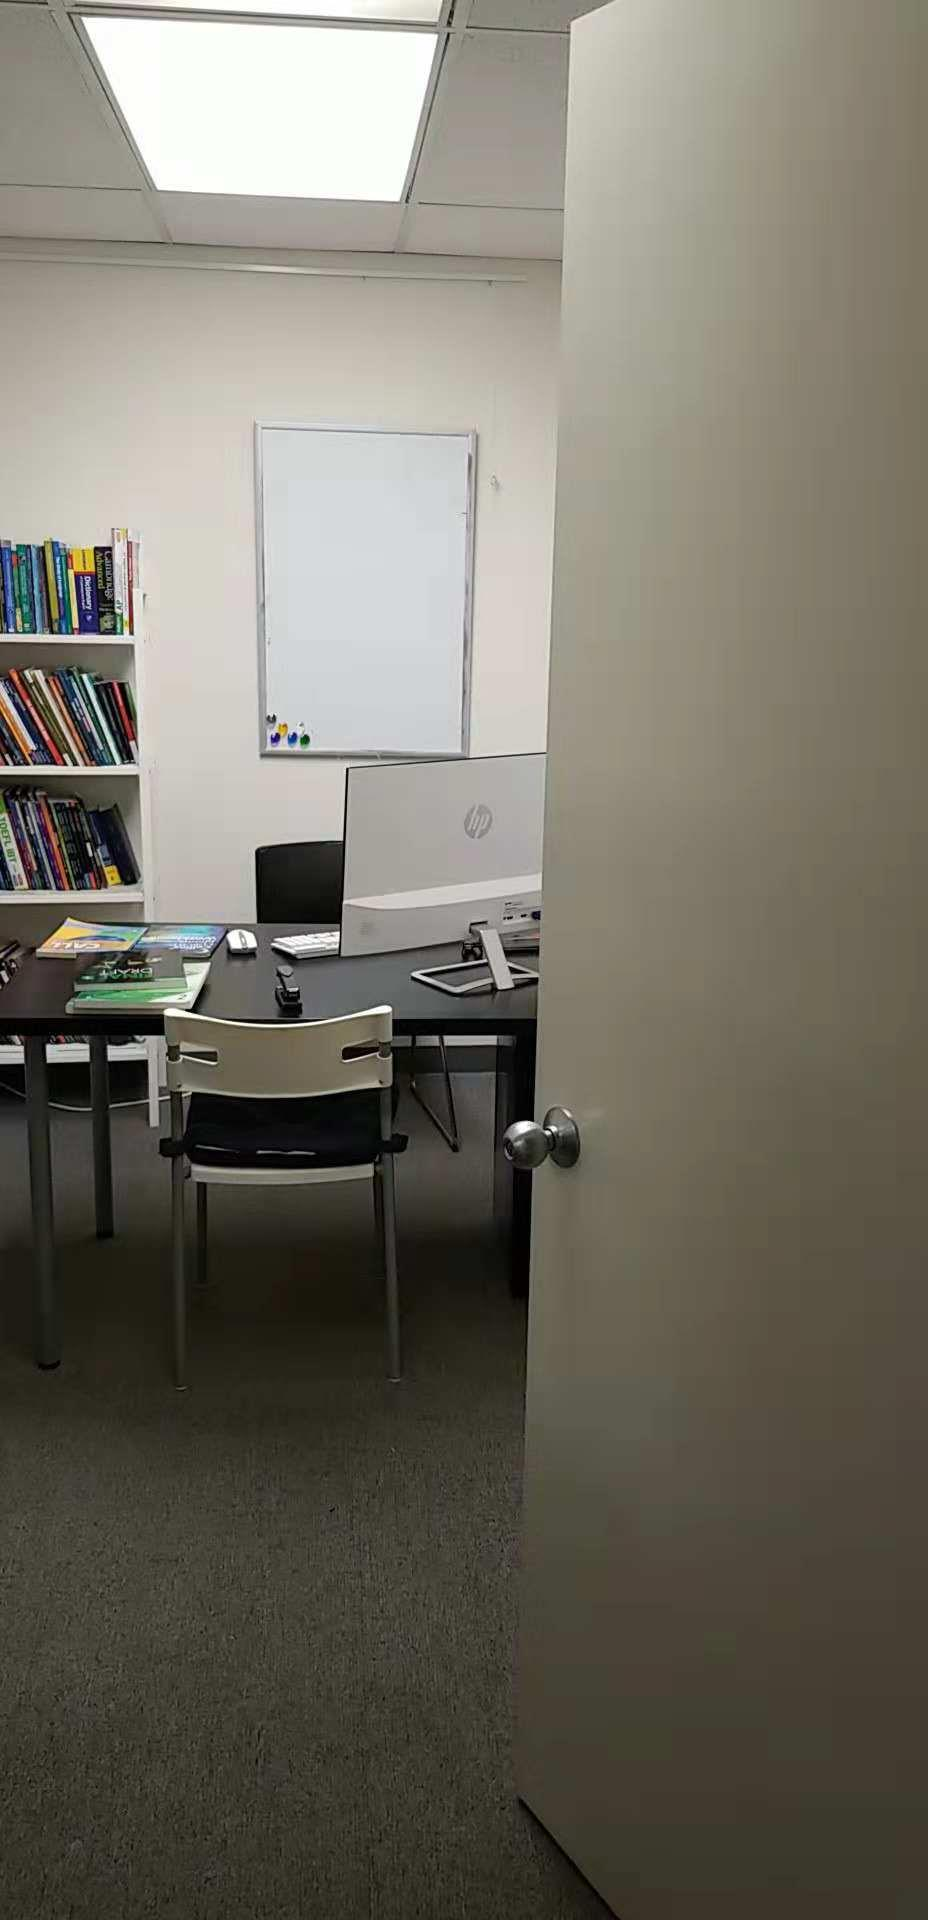 martian science - Office 1